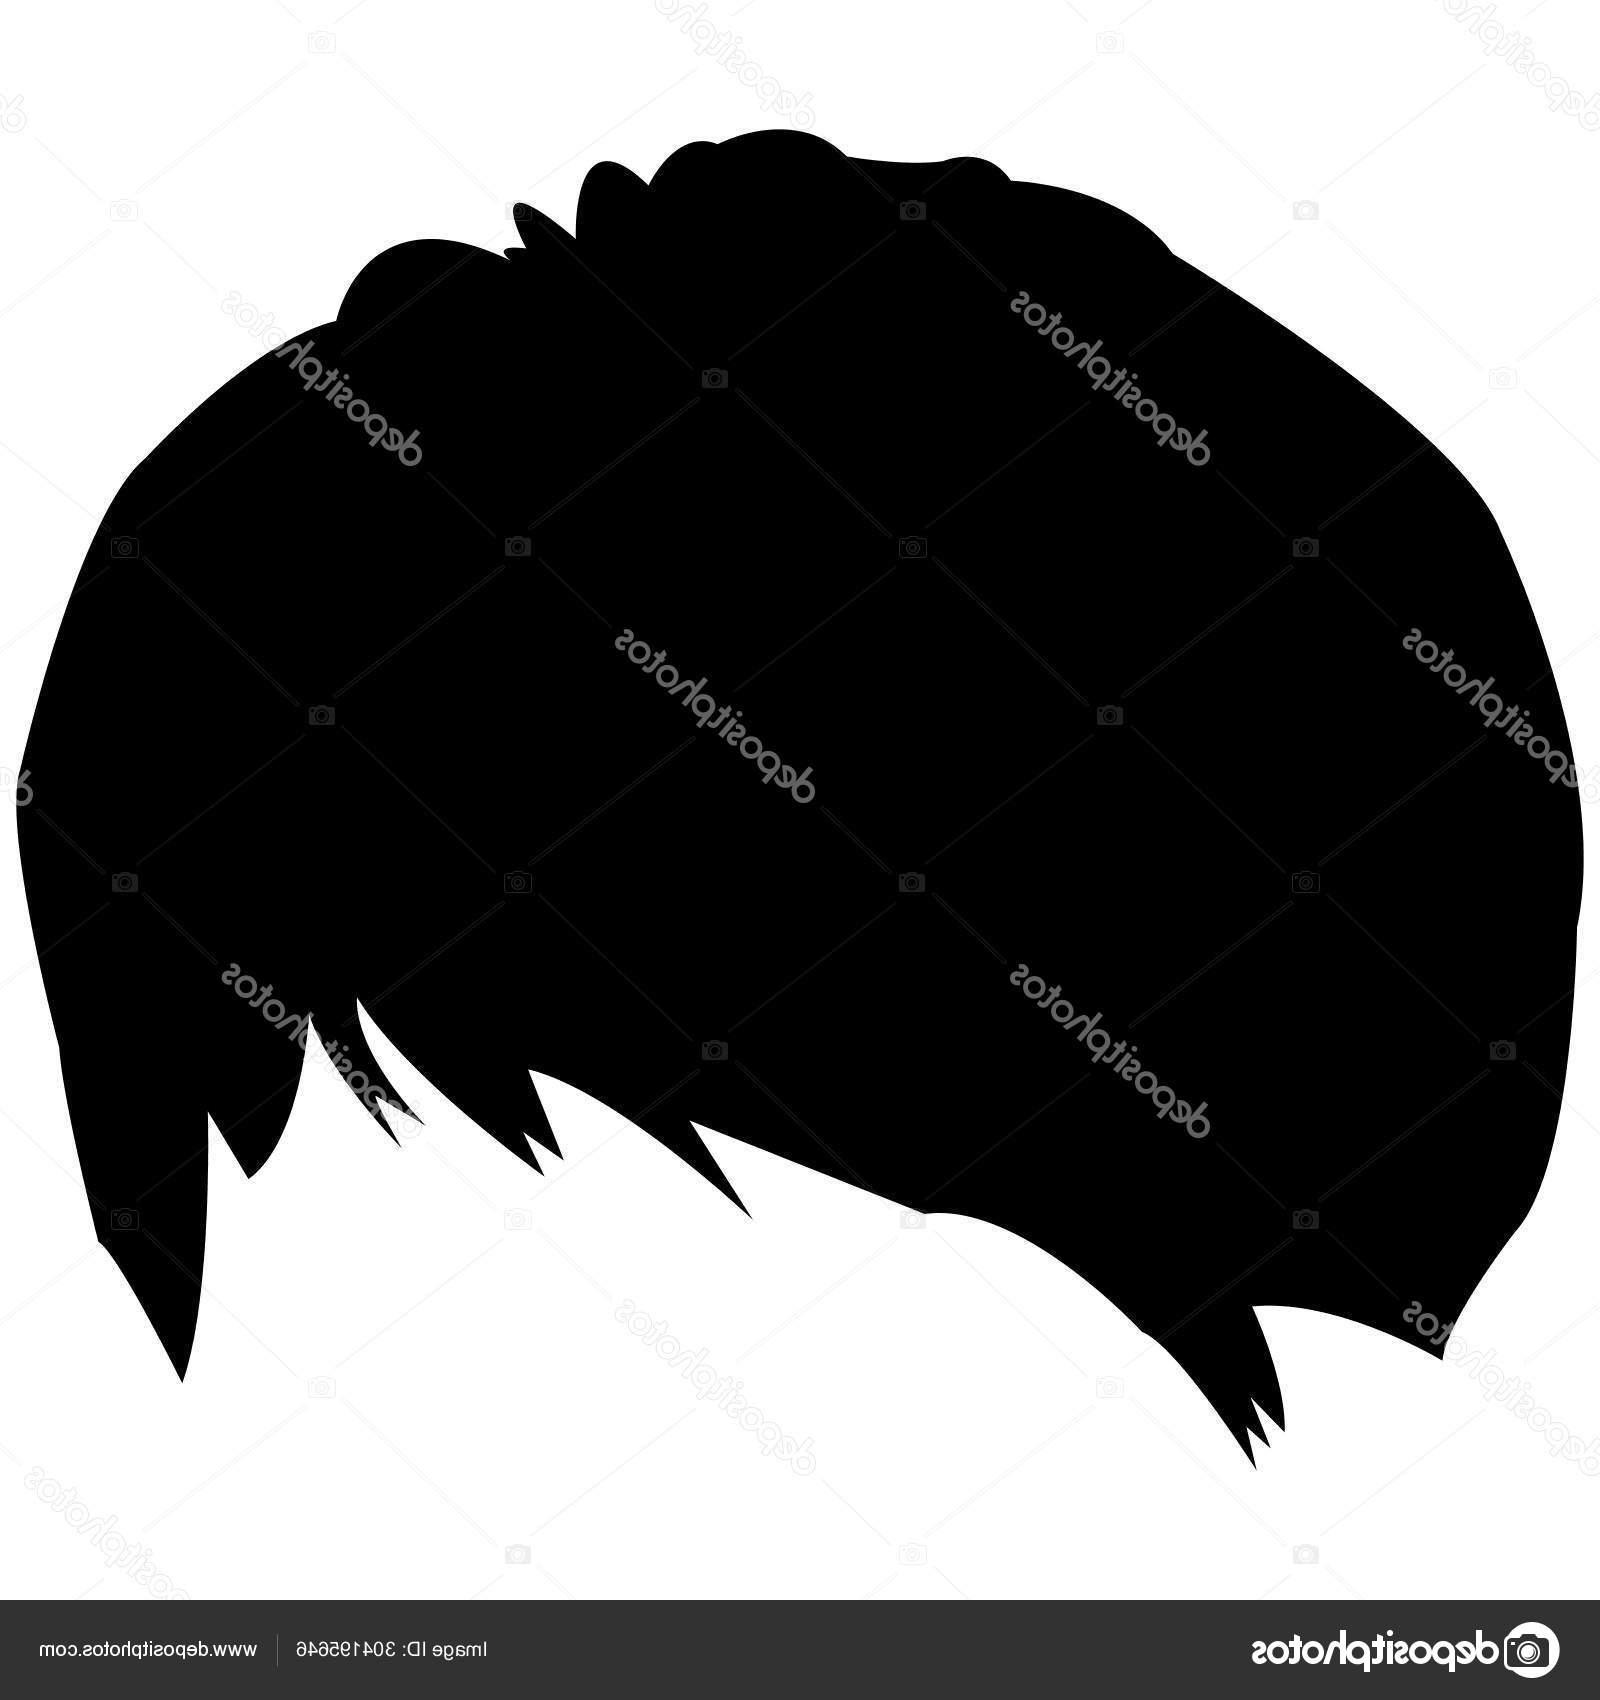 Shag Haircut Простой Дизайн — Векторное Изображение Inside Recent Grungy Shag Haircuts (View 18 of 20)